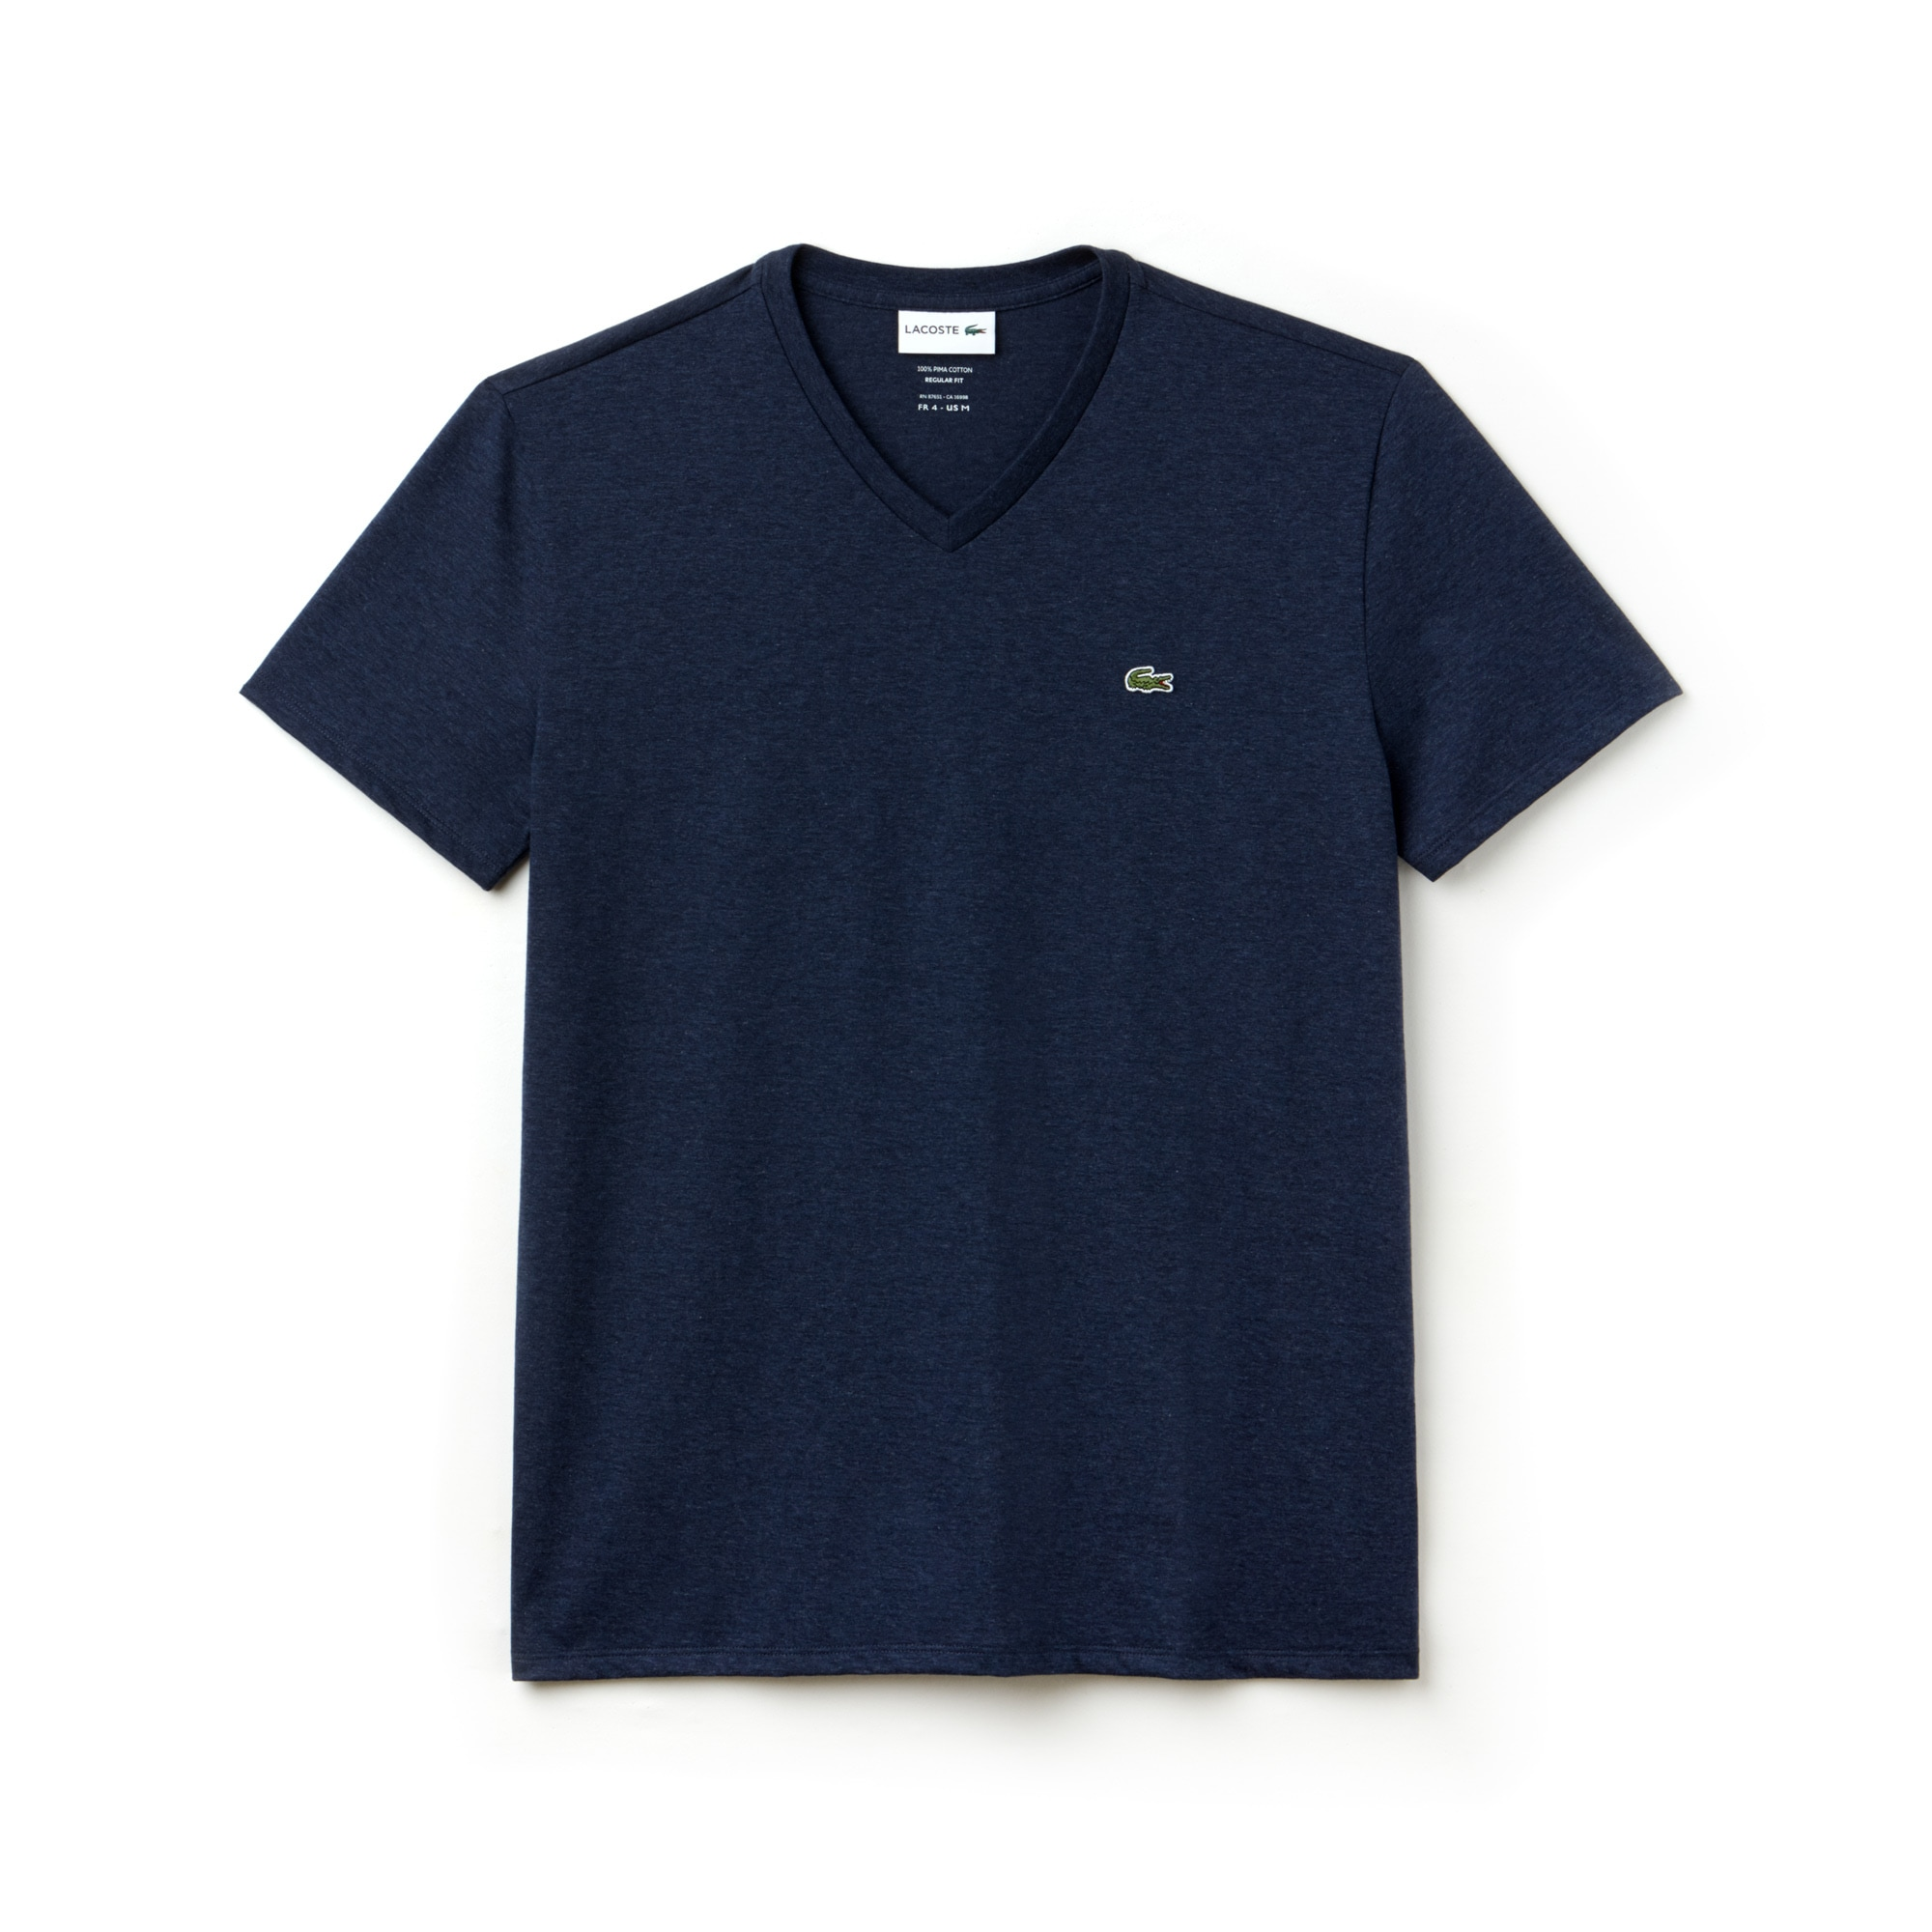 Men's V Neck Lacoste Jersey Pima T-shirt